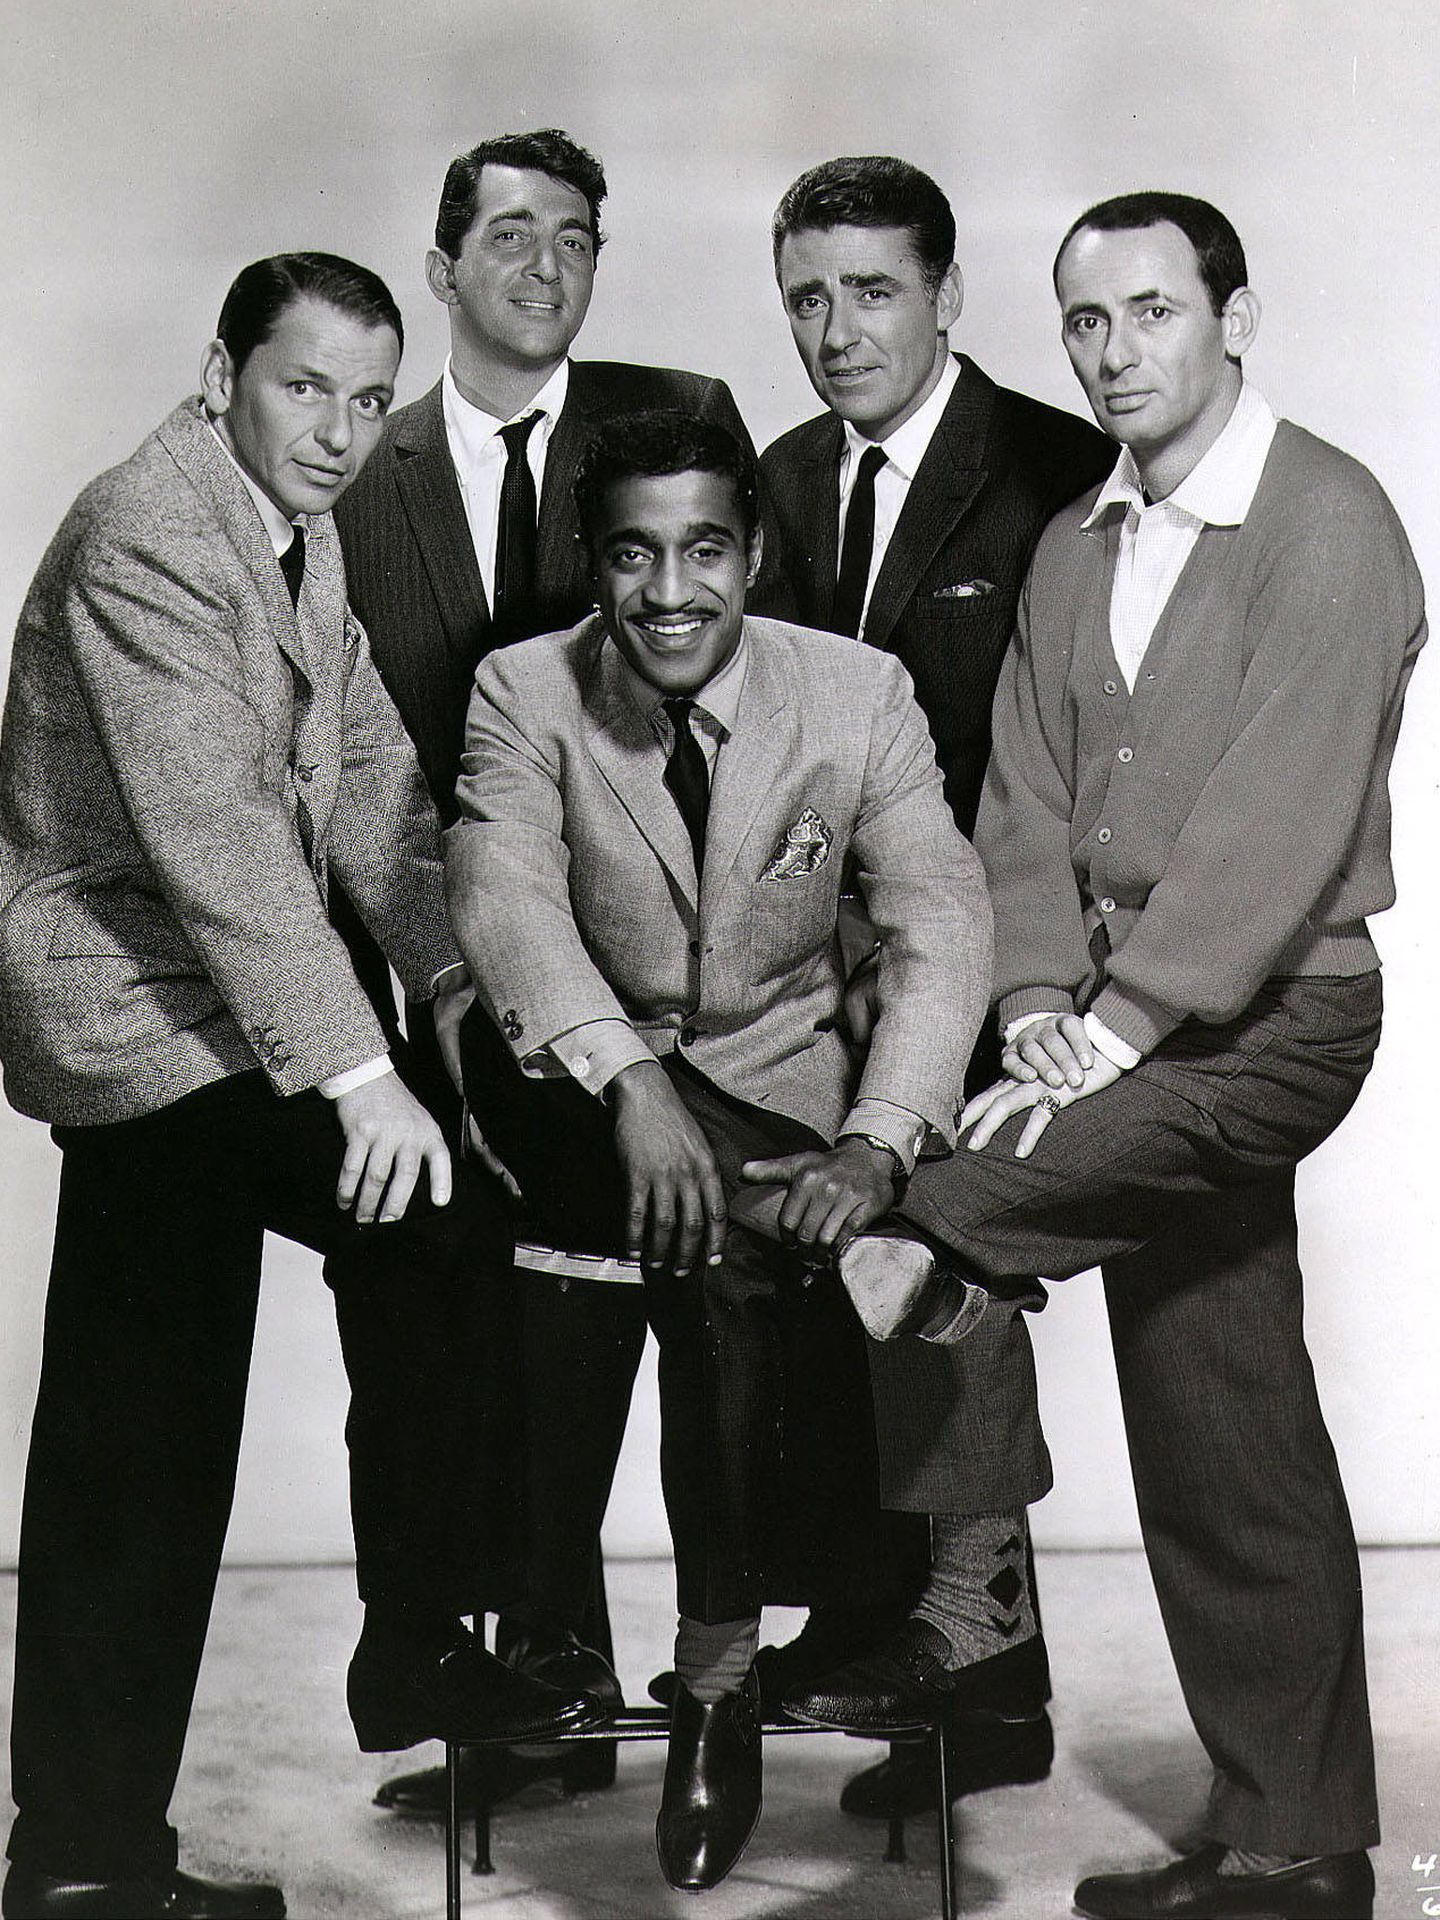 Frank Sinatra, Dean Martin, Sammy Davis Jr, Peter Lawford y Joey Bishop: el Rat Pack. (Getty)